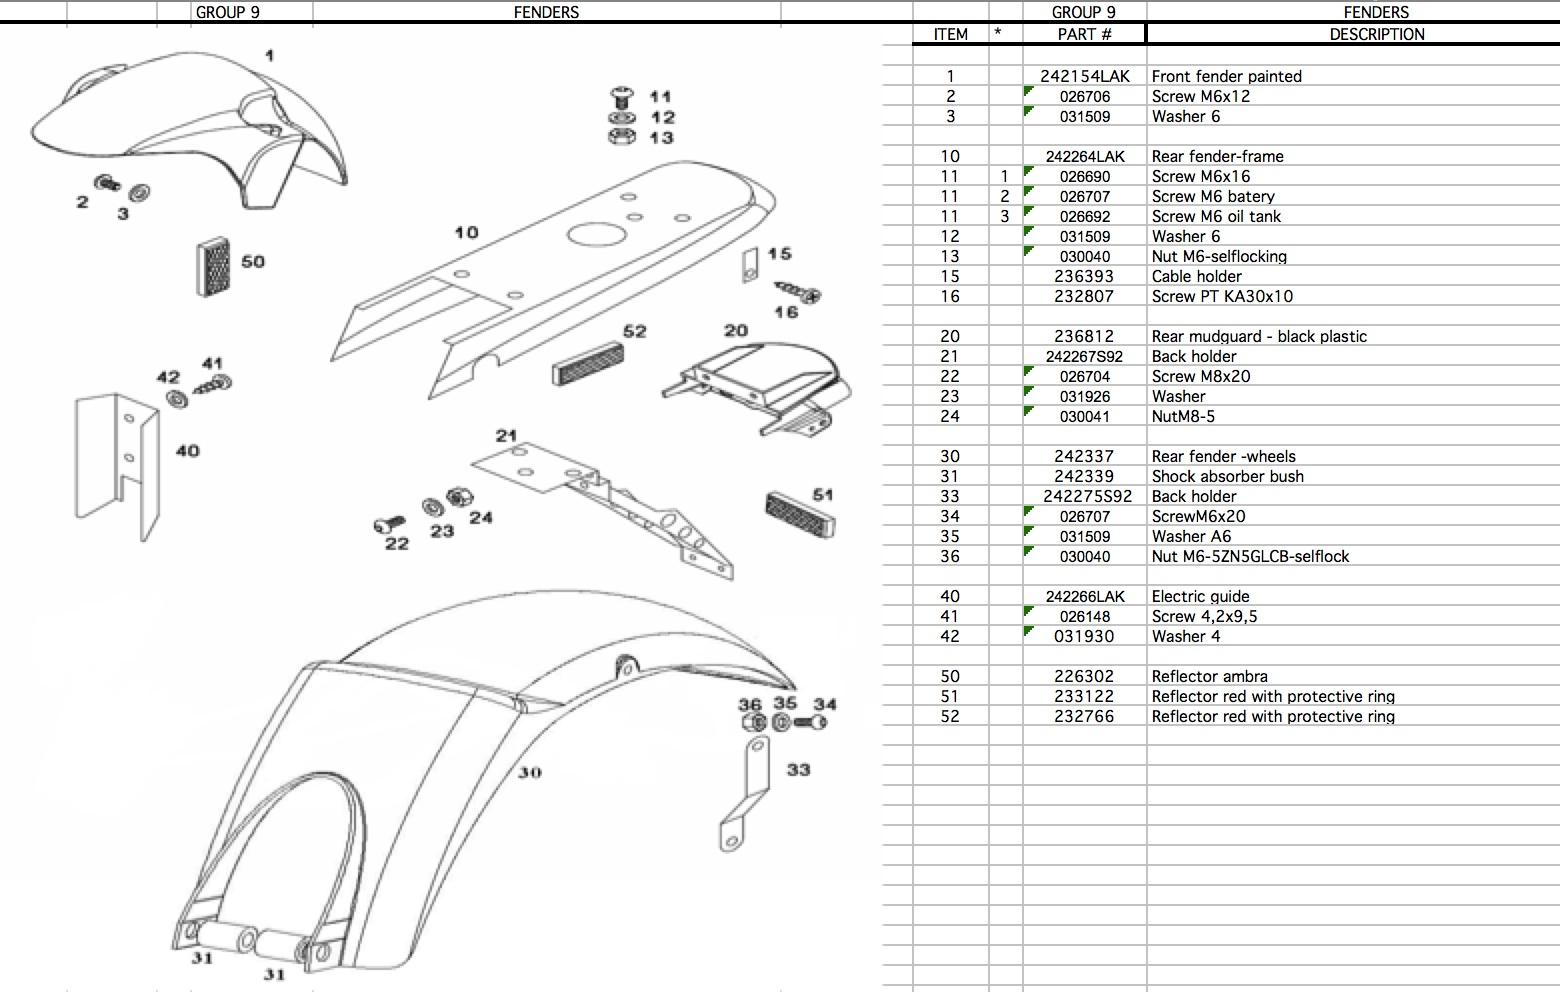 Tomos Scooter Manuals Wiring Diagrams - Wiring Diagrams Schema